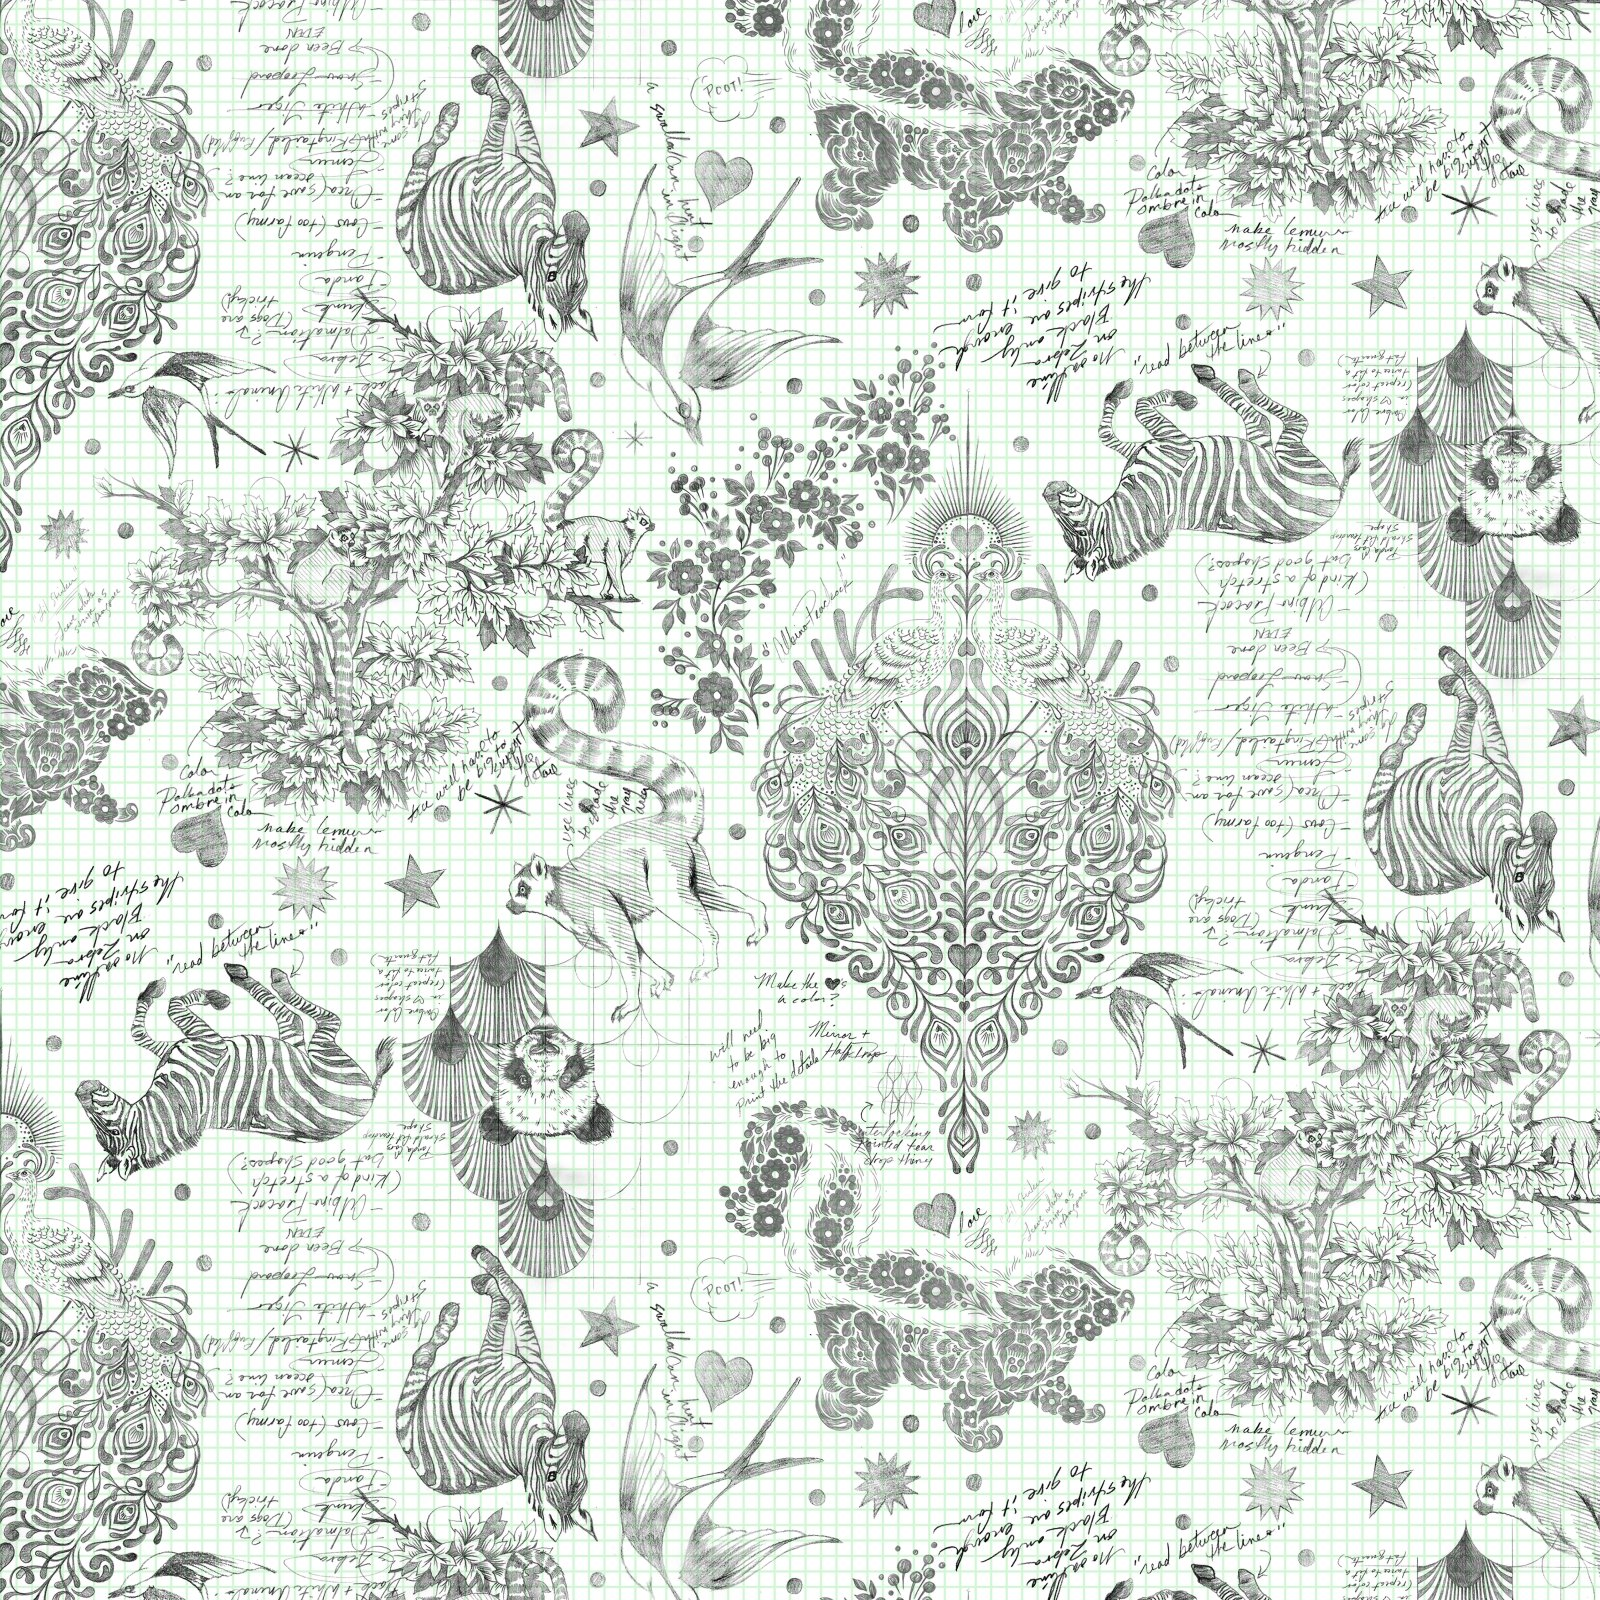 Free Spirit - Tula Pink - Linework - Sketchyer in Paper - *PRE-ORDER